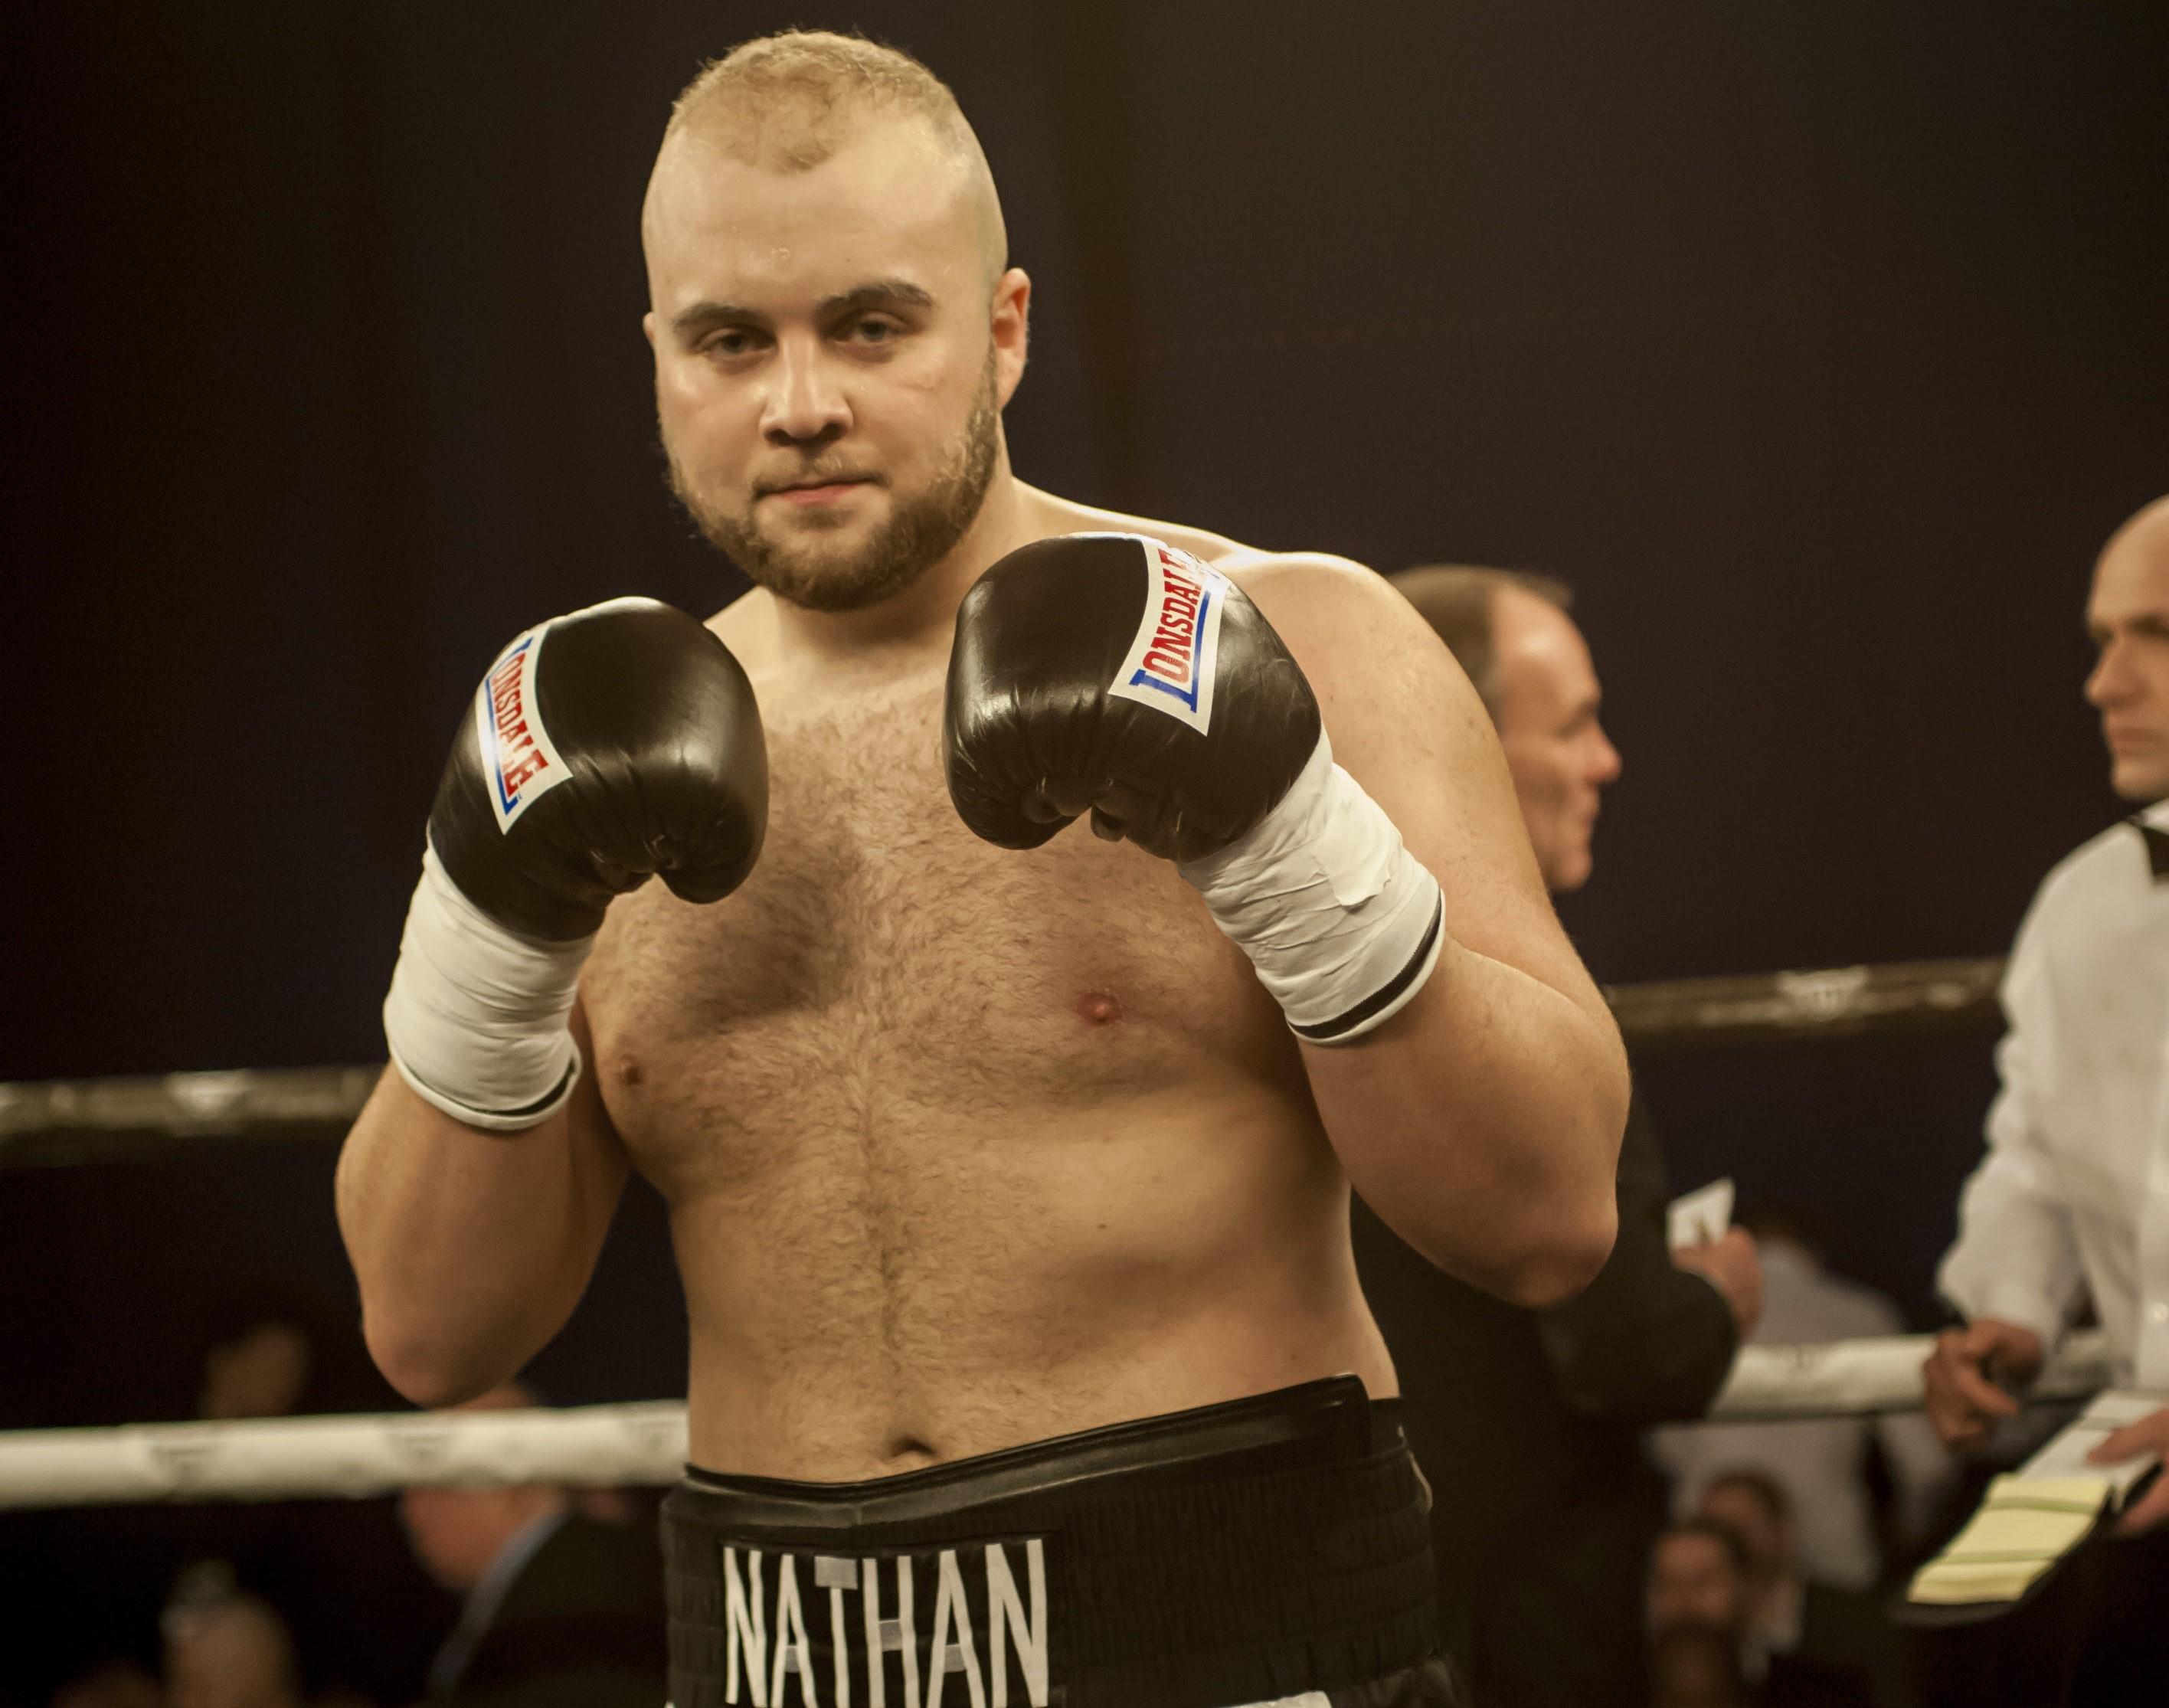 Nathan Gorman